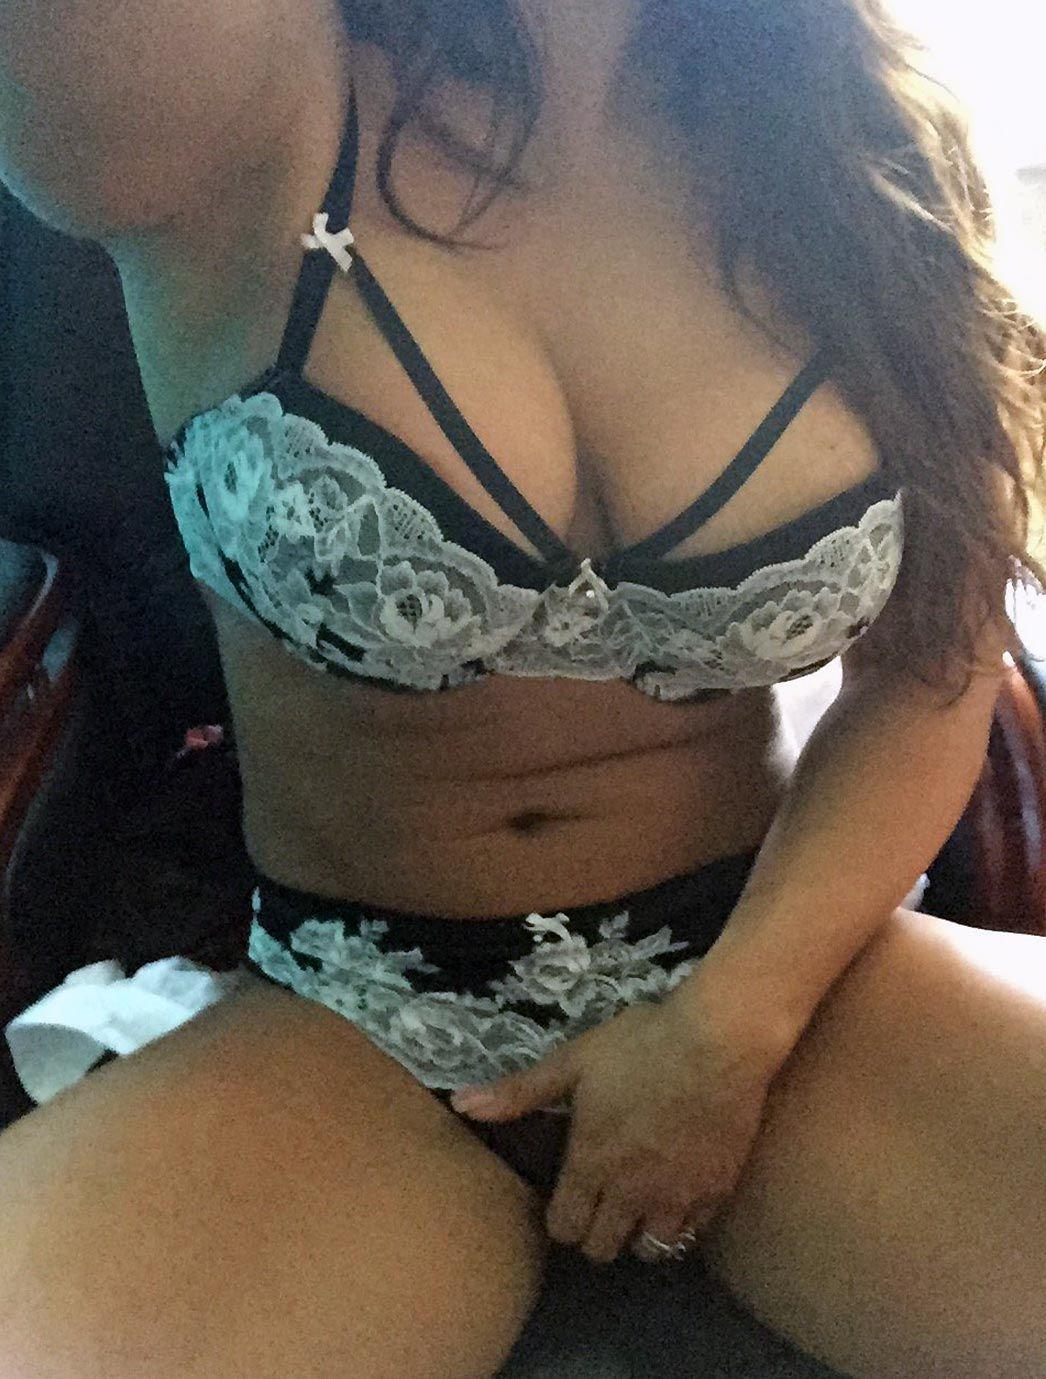 Celeste Bonin Nude Leaked The Fappening & Sexy 0178